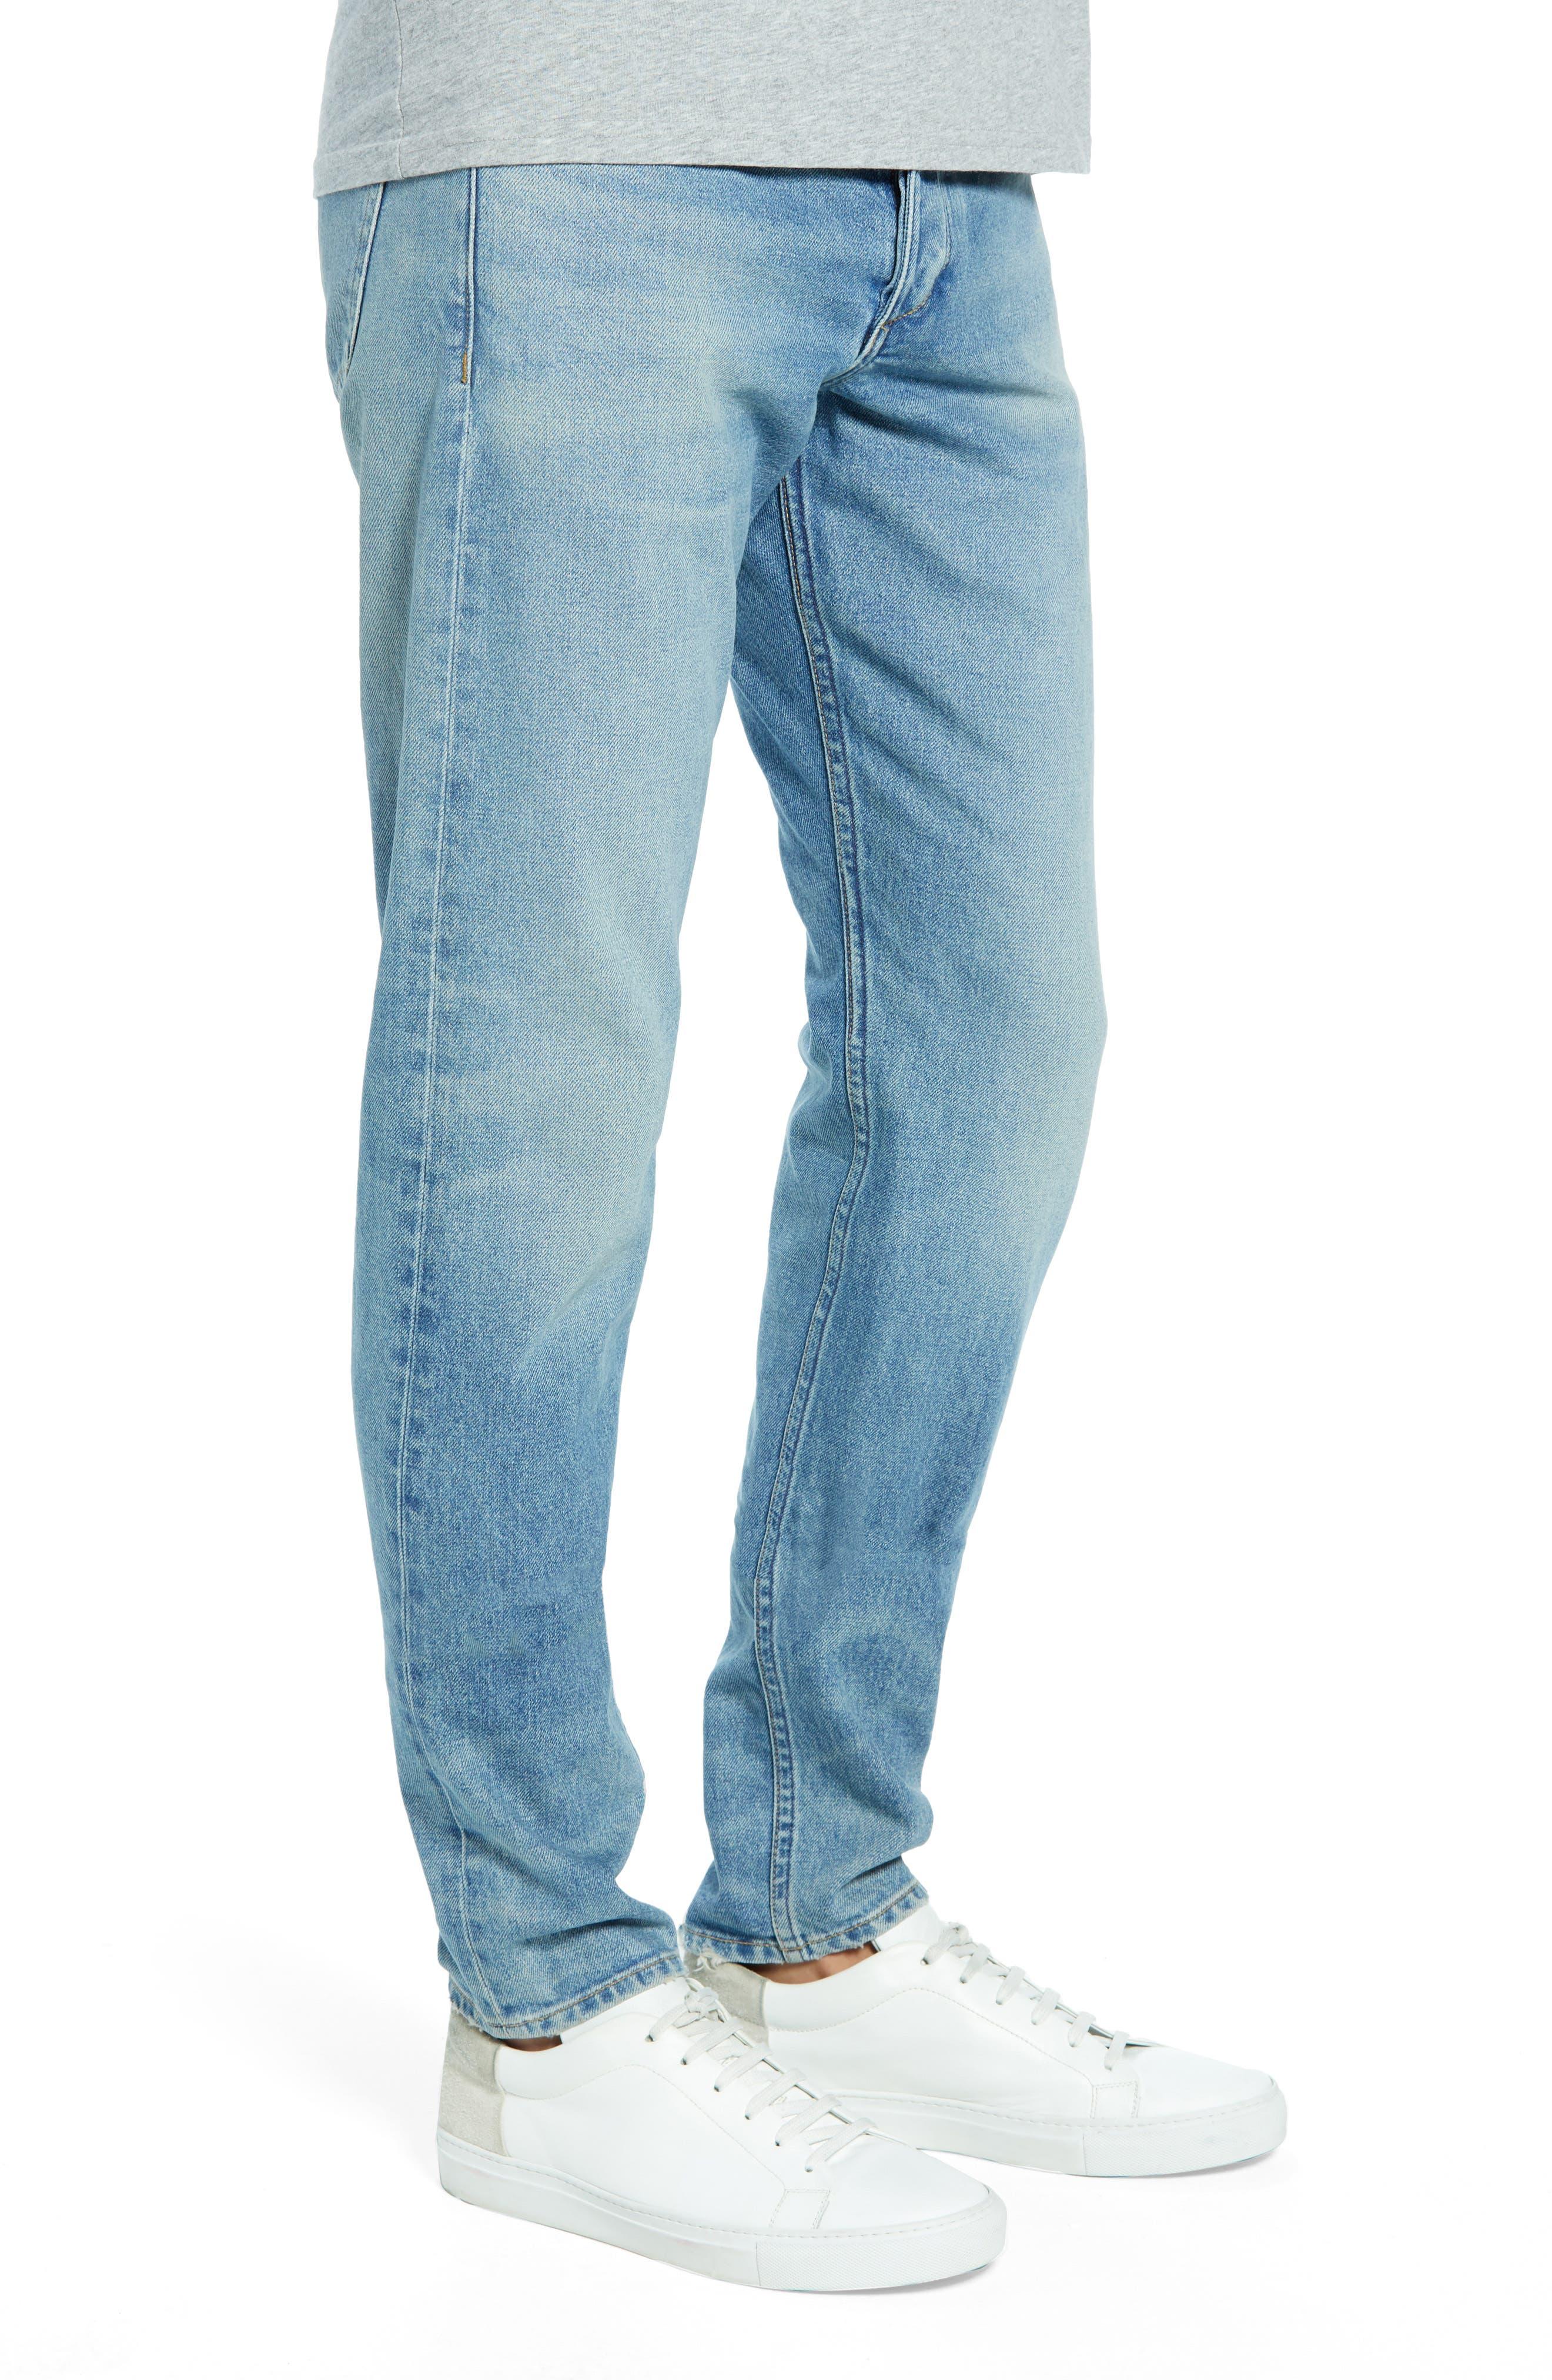 Fit 1 Skinny Fit Jeans,                             Alternate thumbnail 3, color,                             JAMIE